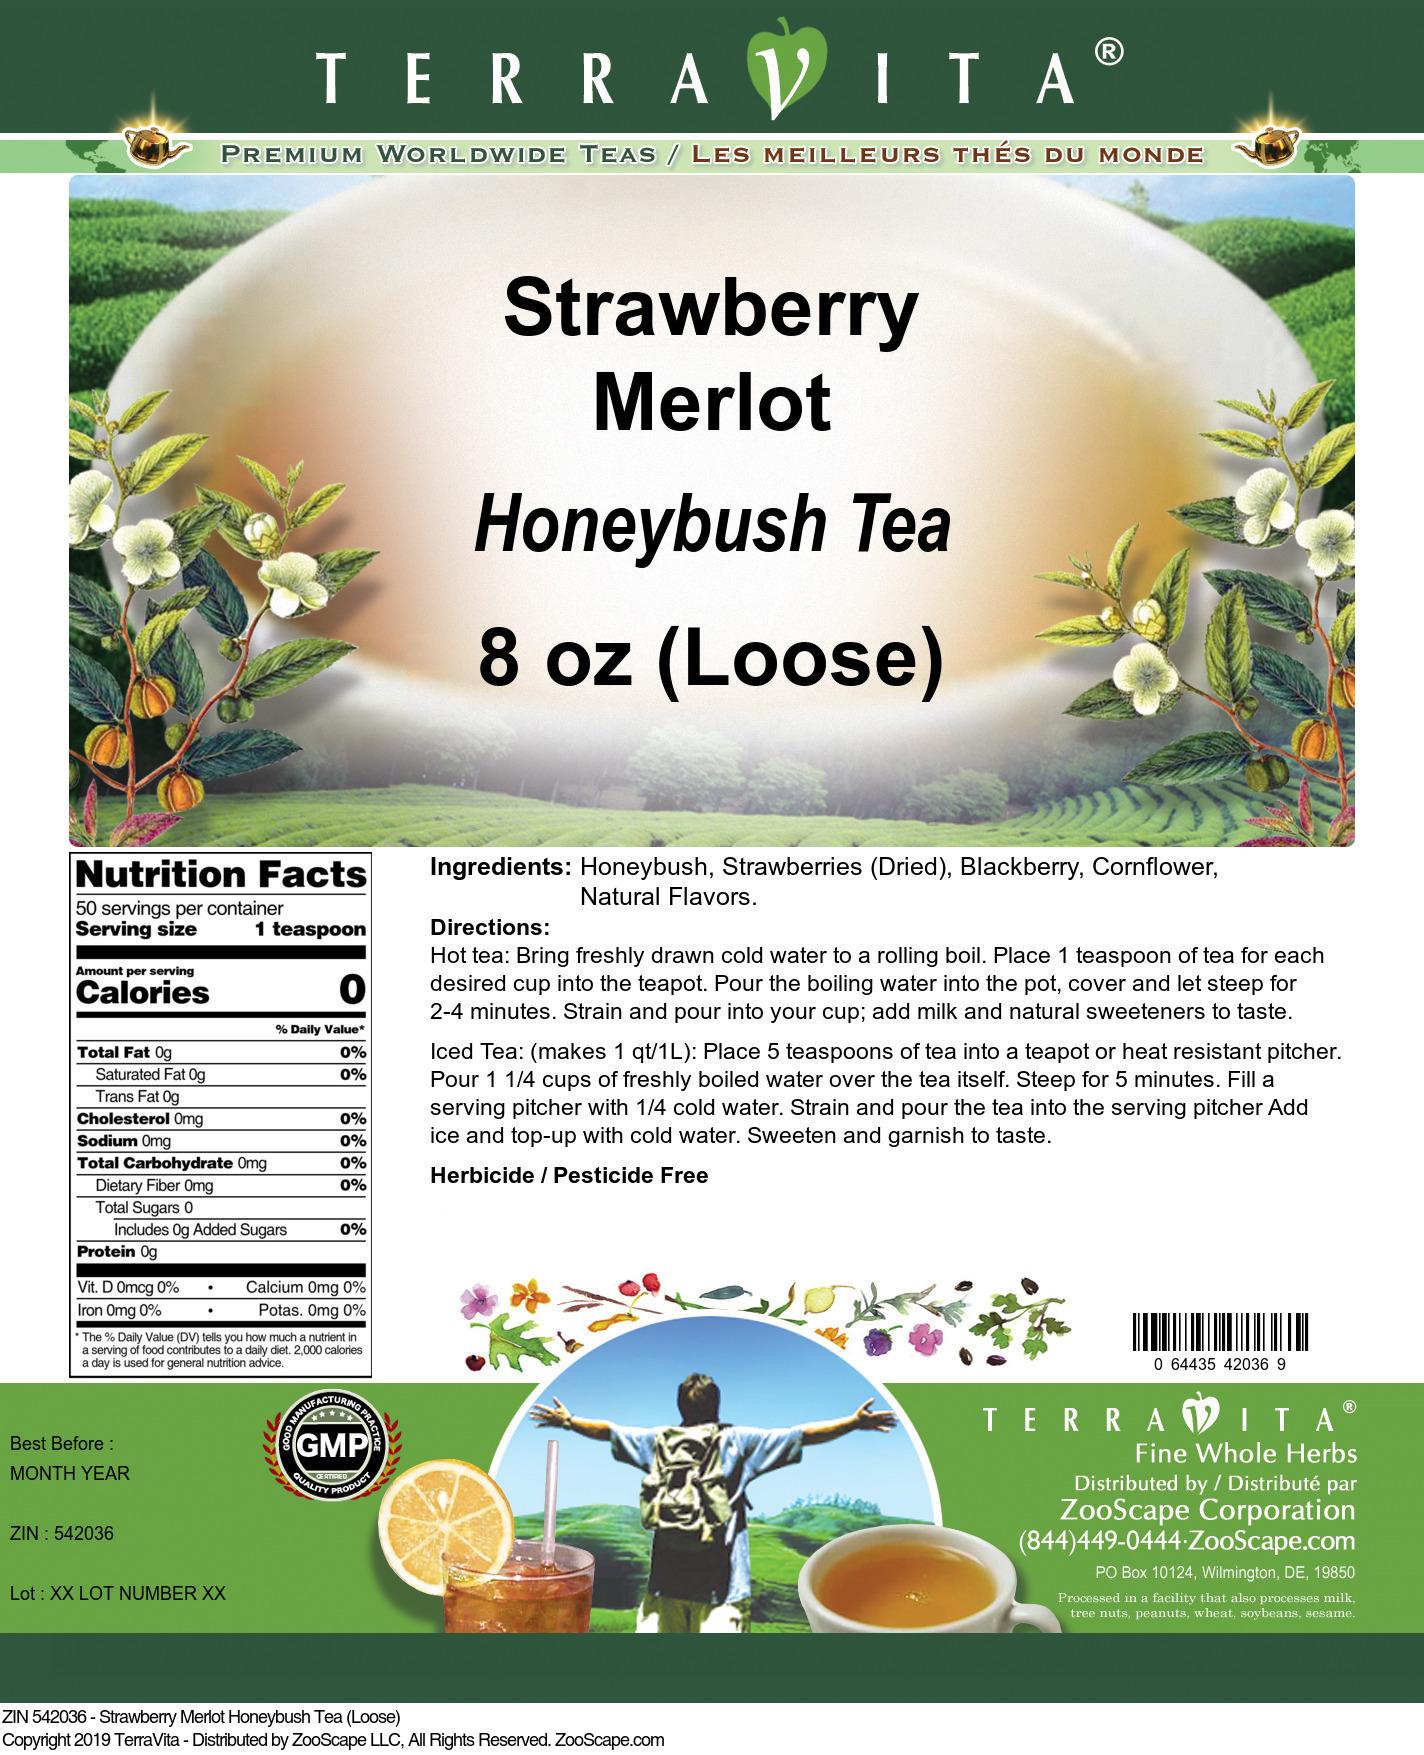 Strawberry Merlot Honeybush Tea (Loose)